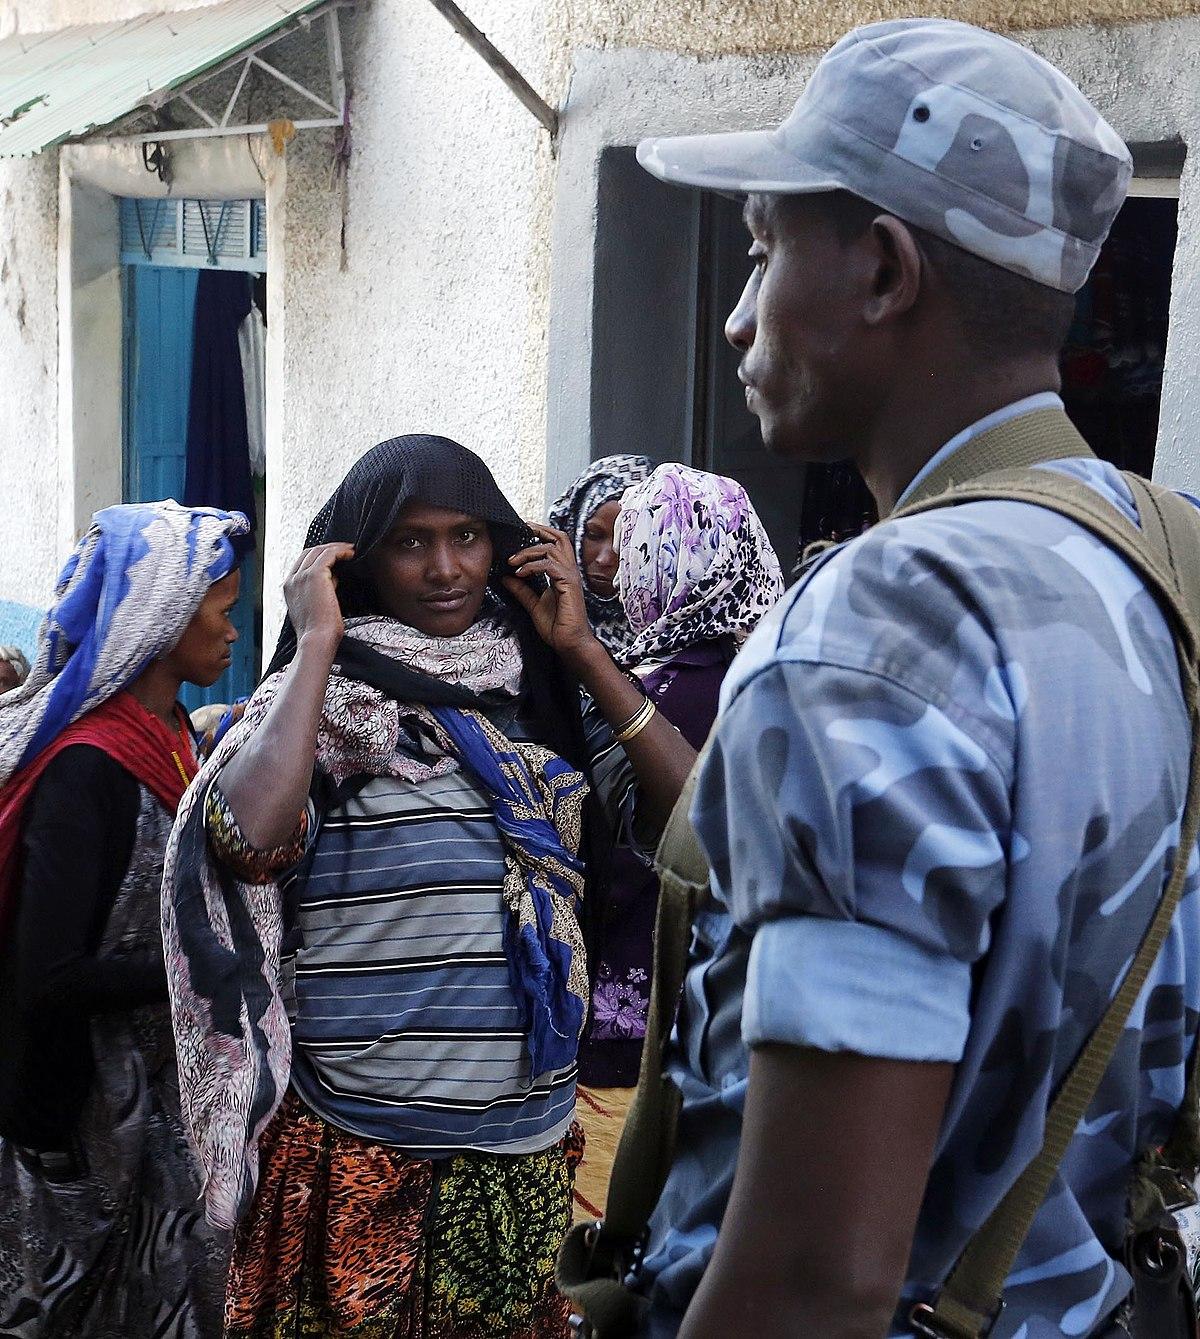 law enforcement in ethiopia